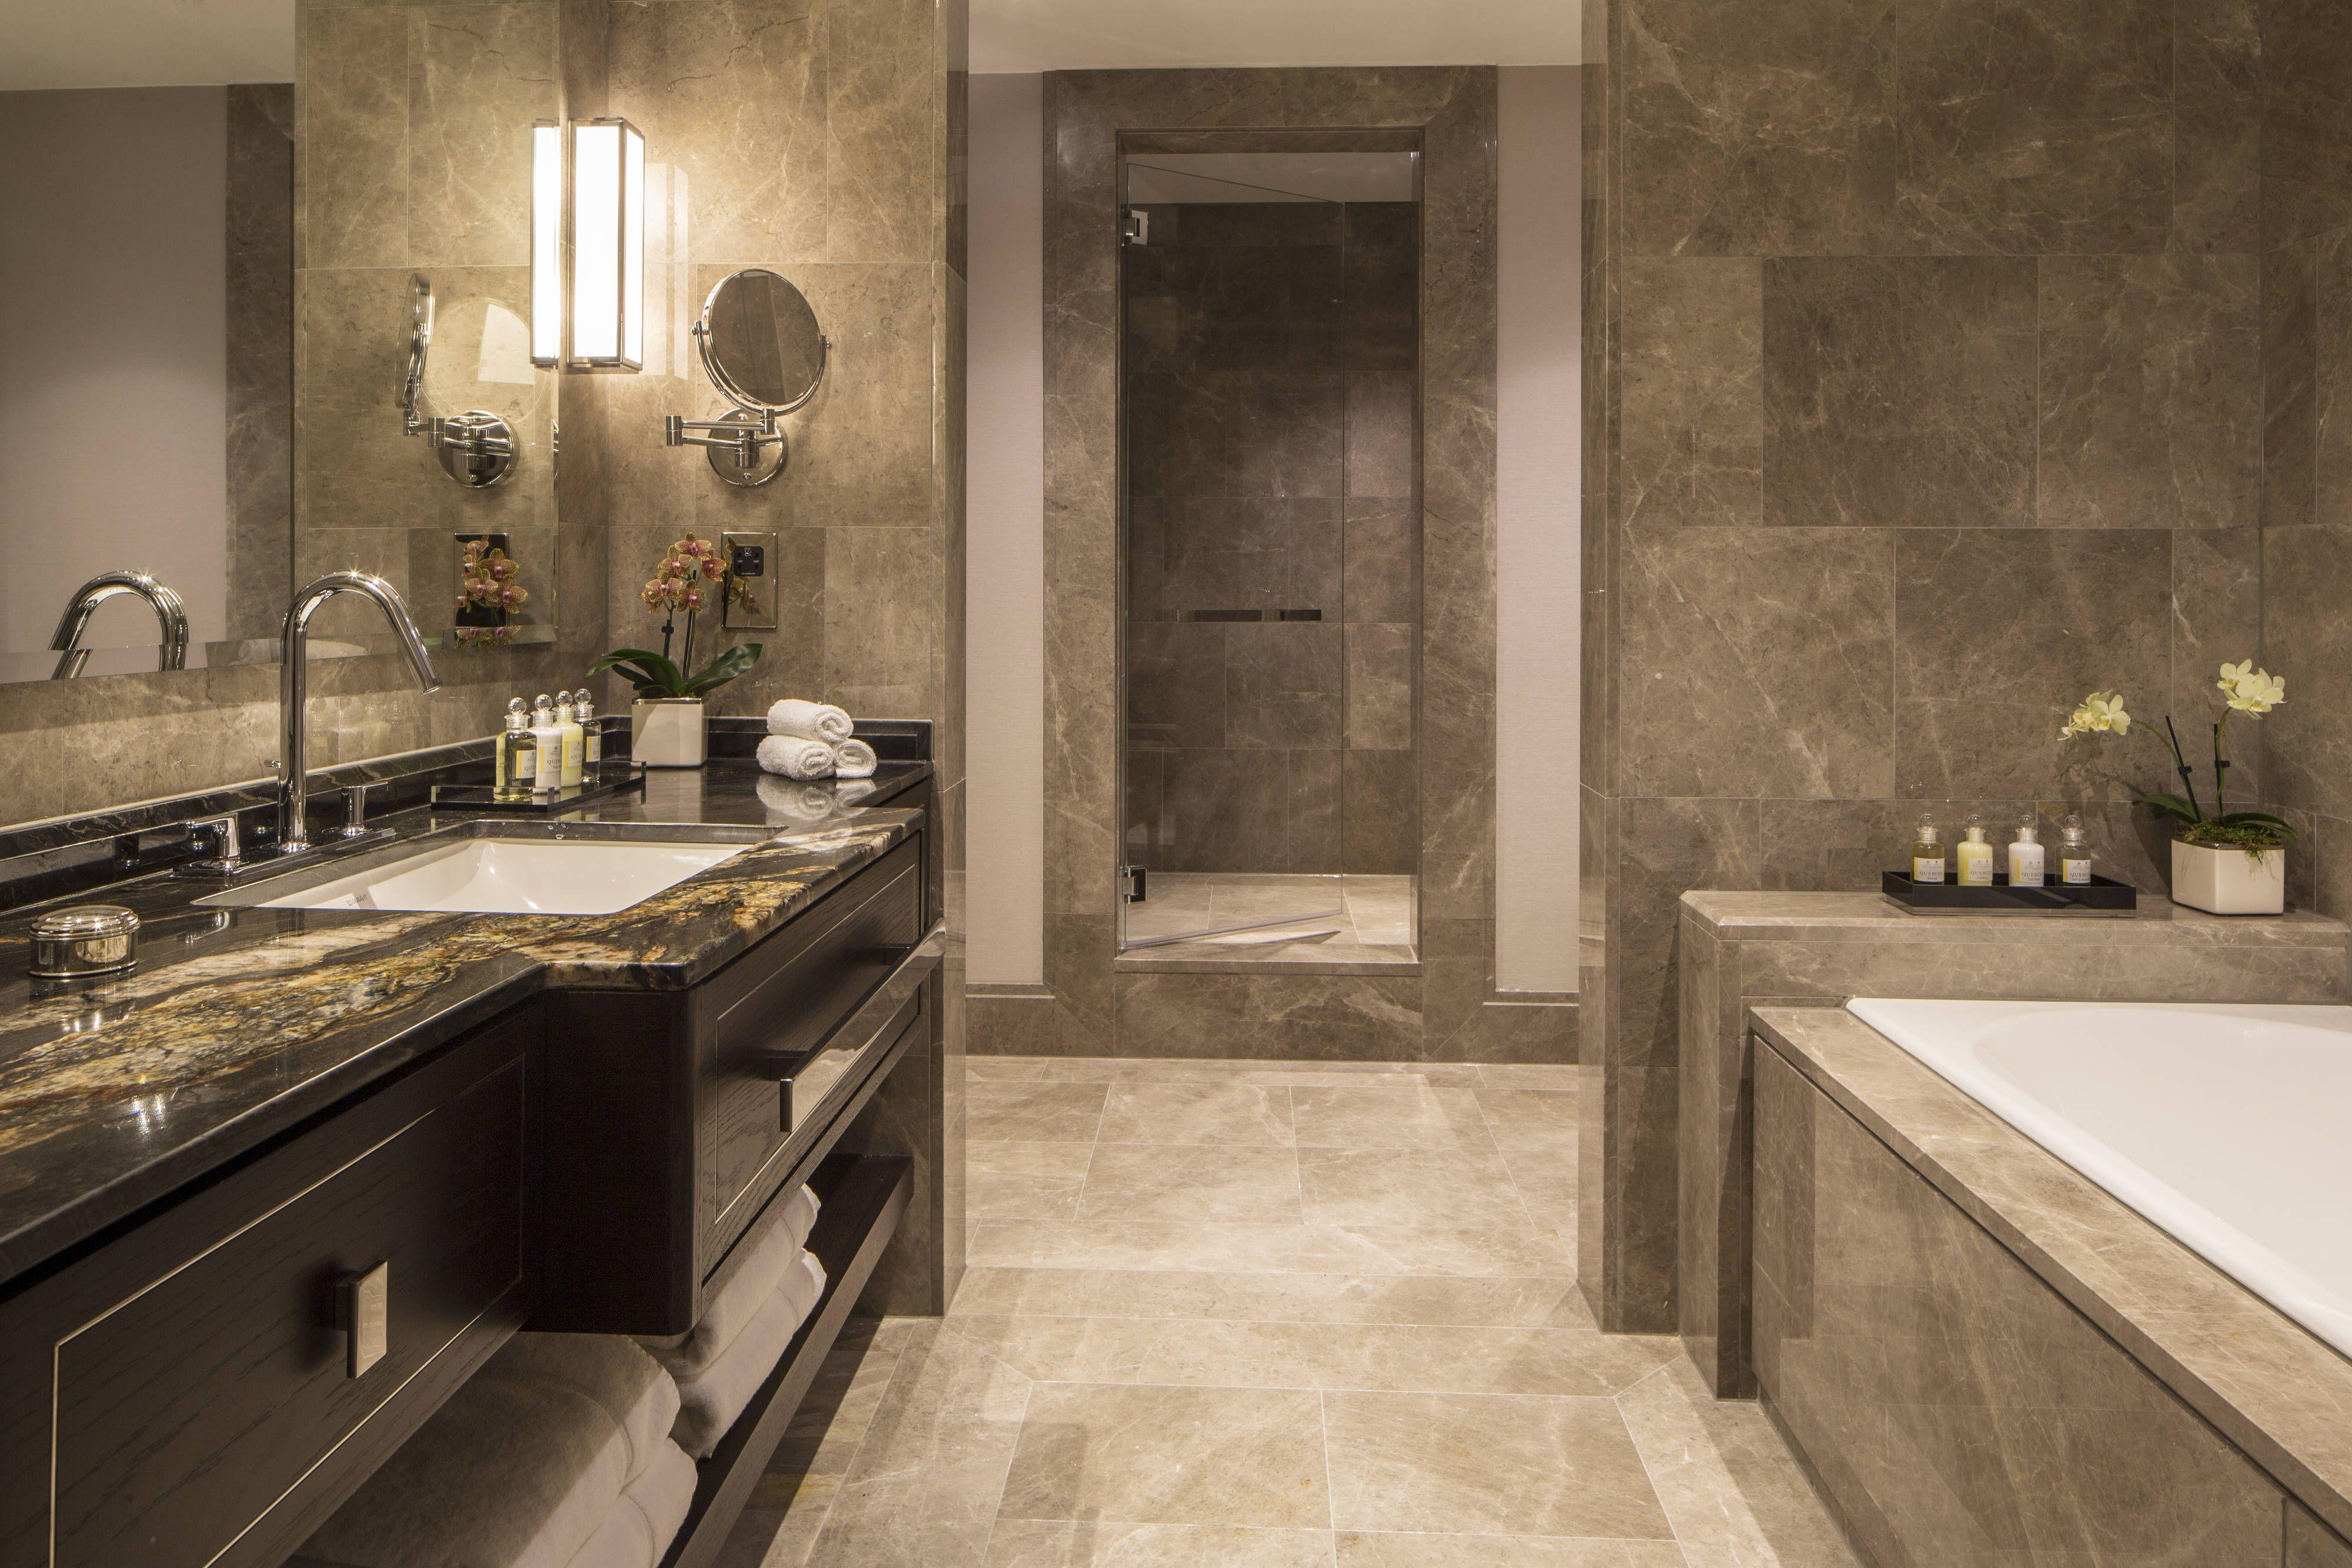 Grosvenor House A Jw Marriott Hotel Premium Executive Suite Bathroom Travel Guestroom Bathroom Design Small Bathroom Design Black Bathroom Remodel Master